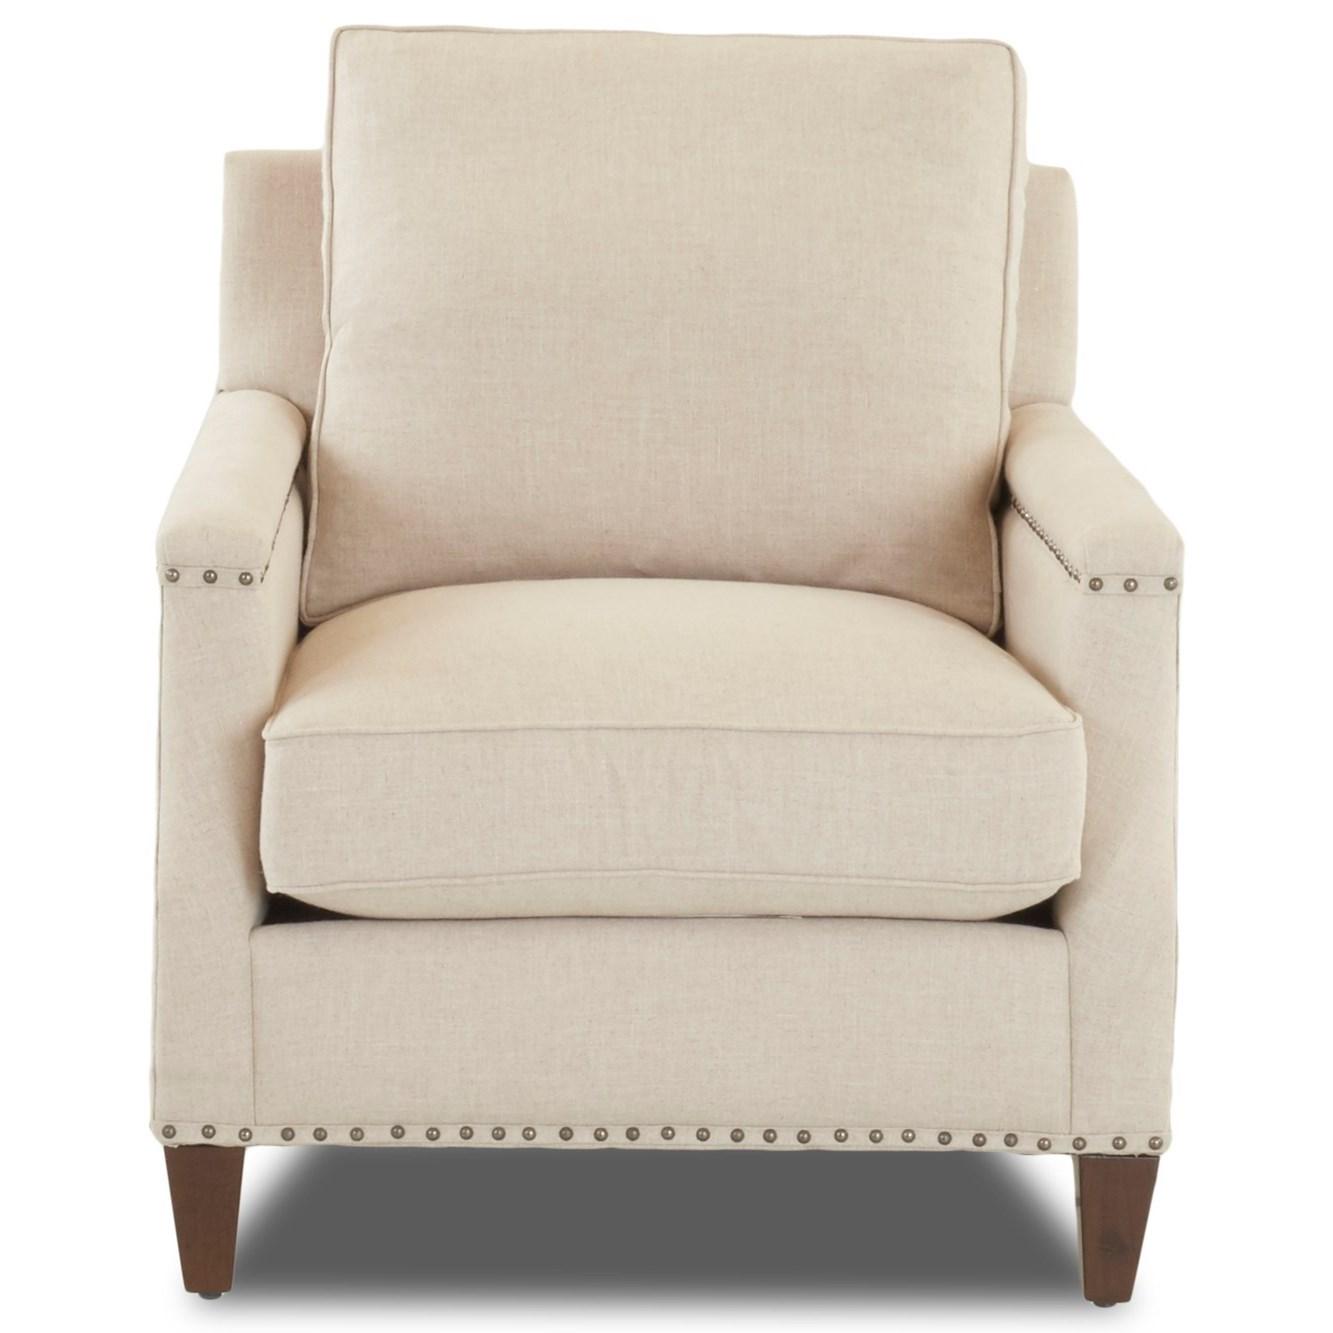 Great Klaussner Bond (Distinctions By Klaussner) Chair   Item Number: D18510  C Studio